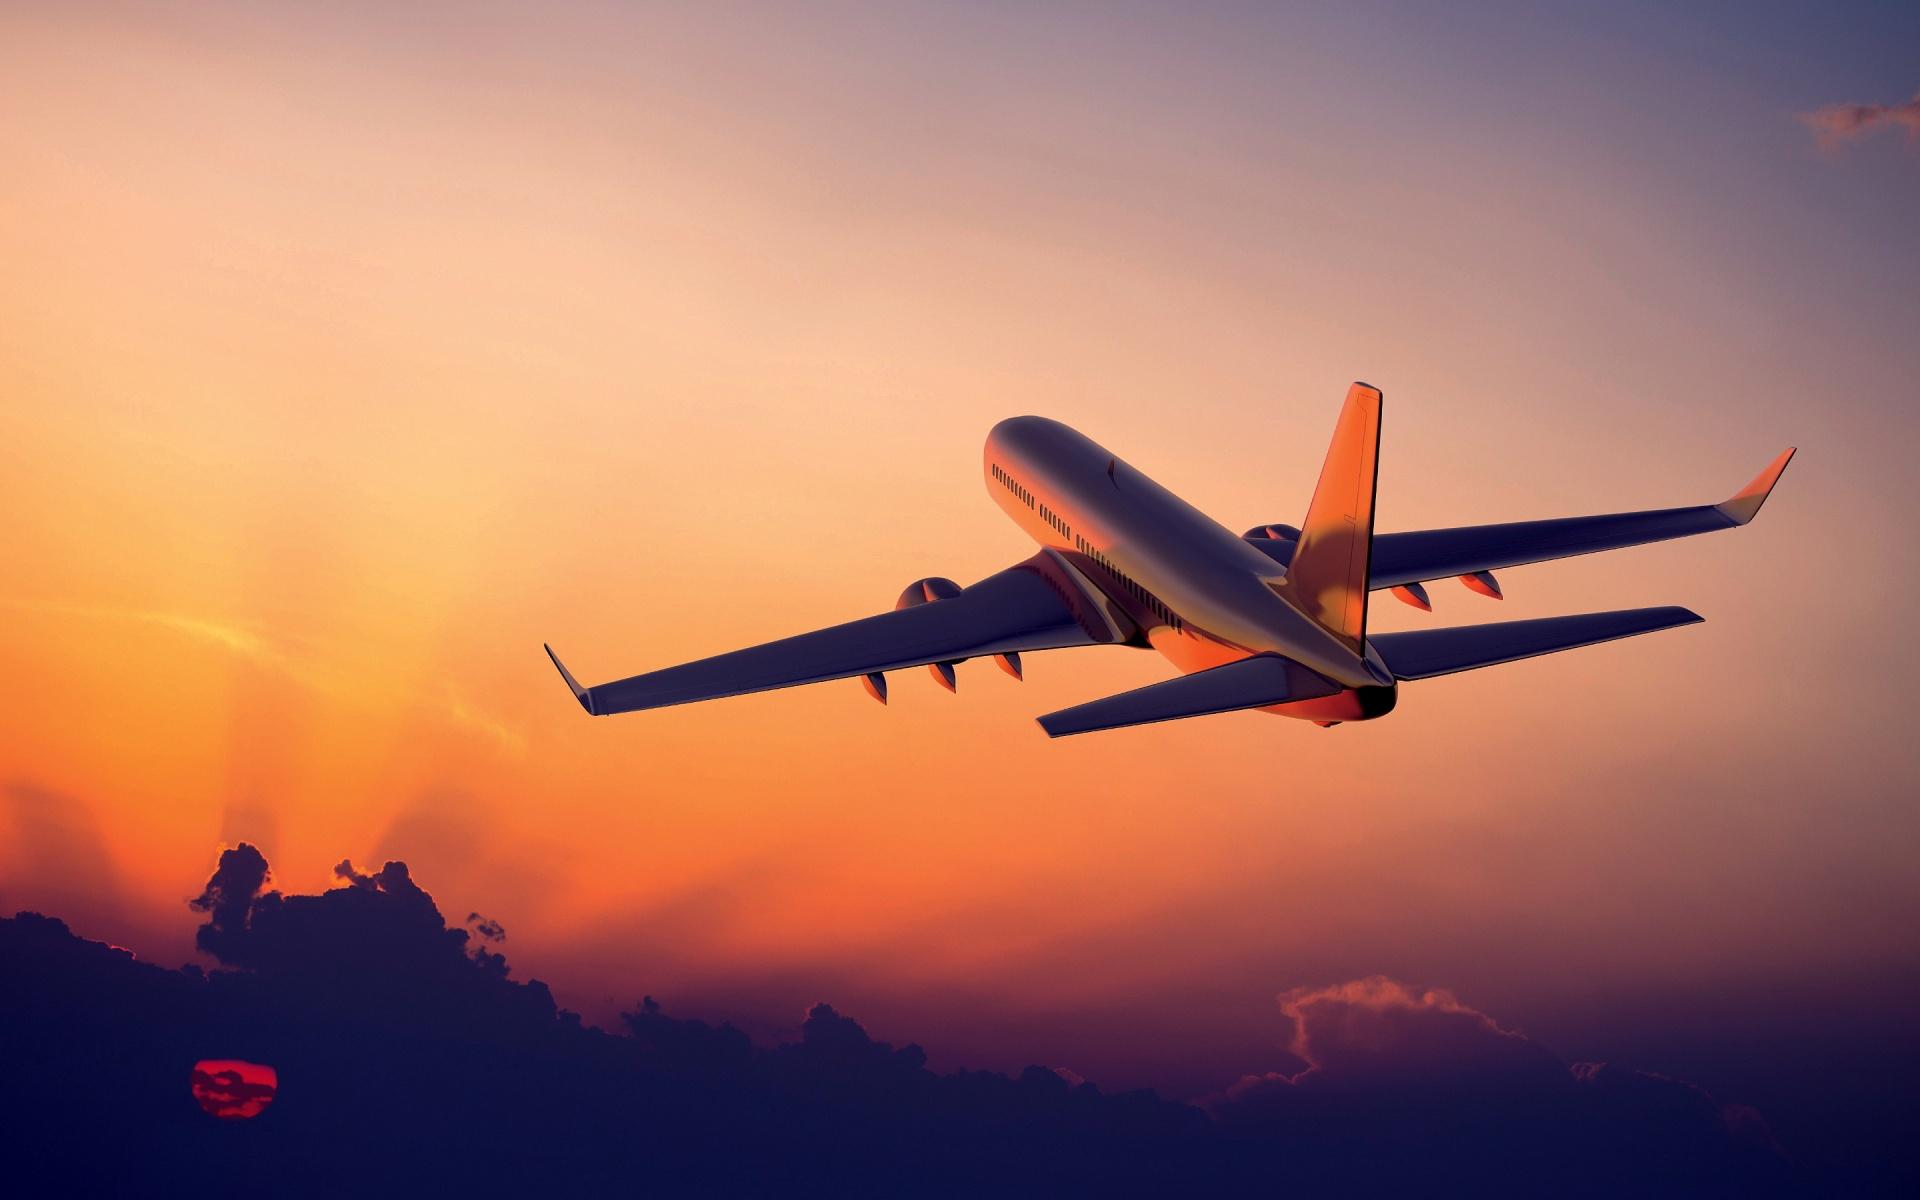 Amazing Flight Wallpaper